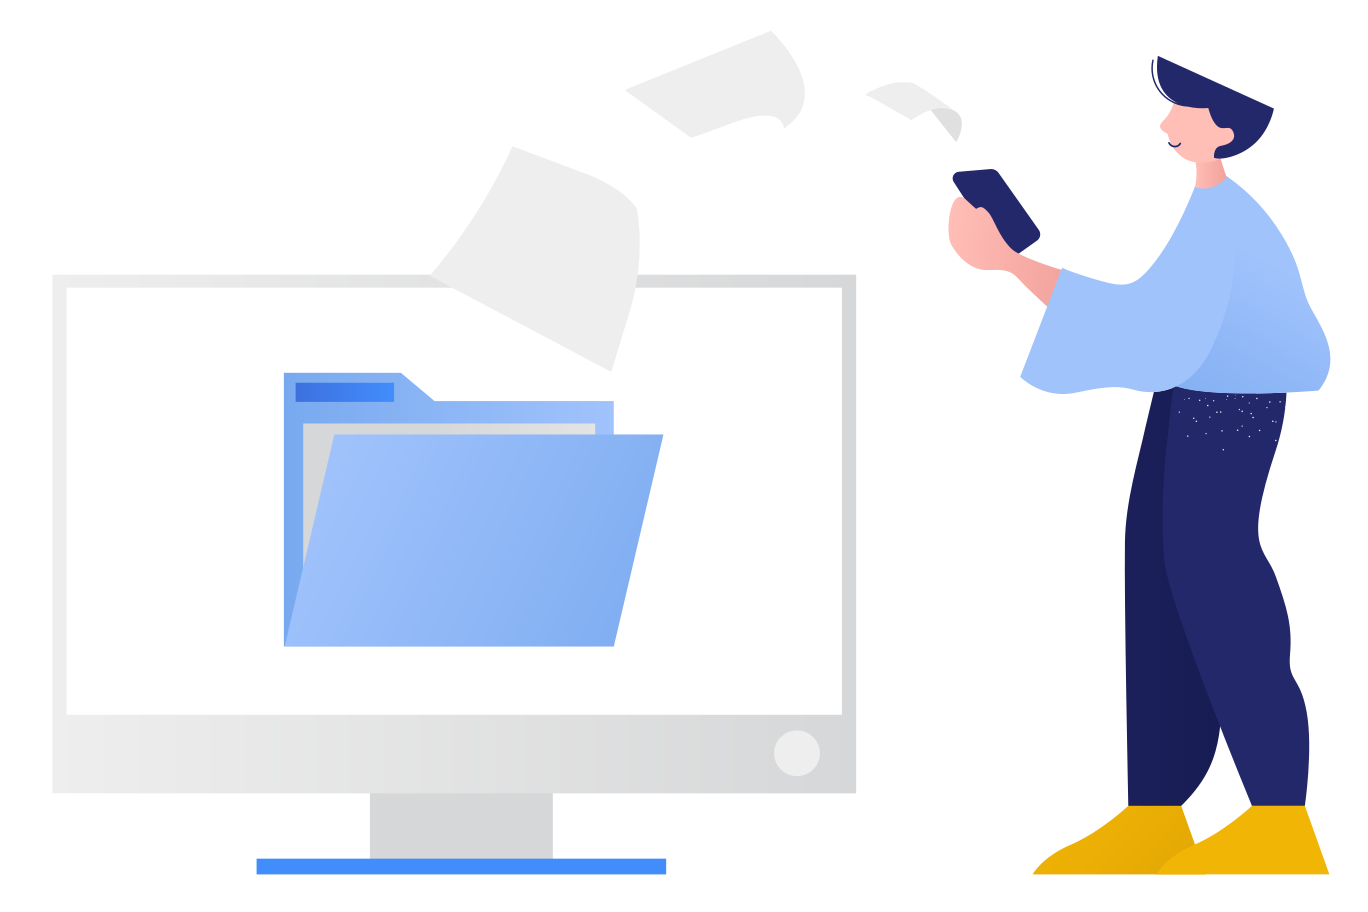 Datei übertragung Clipart-Grafik als PNG, SVG